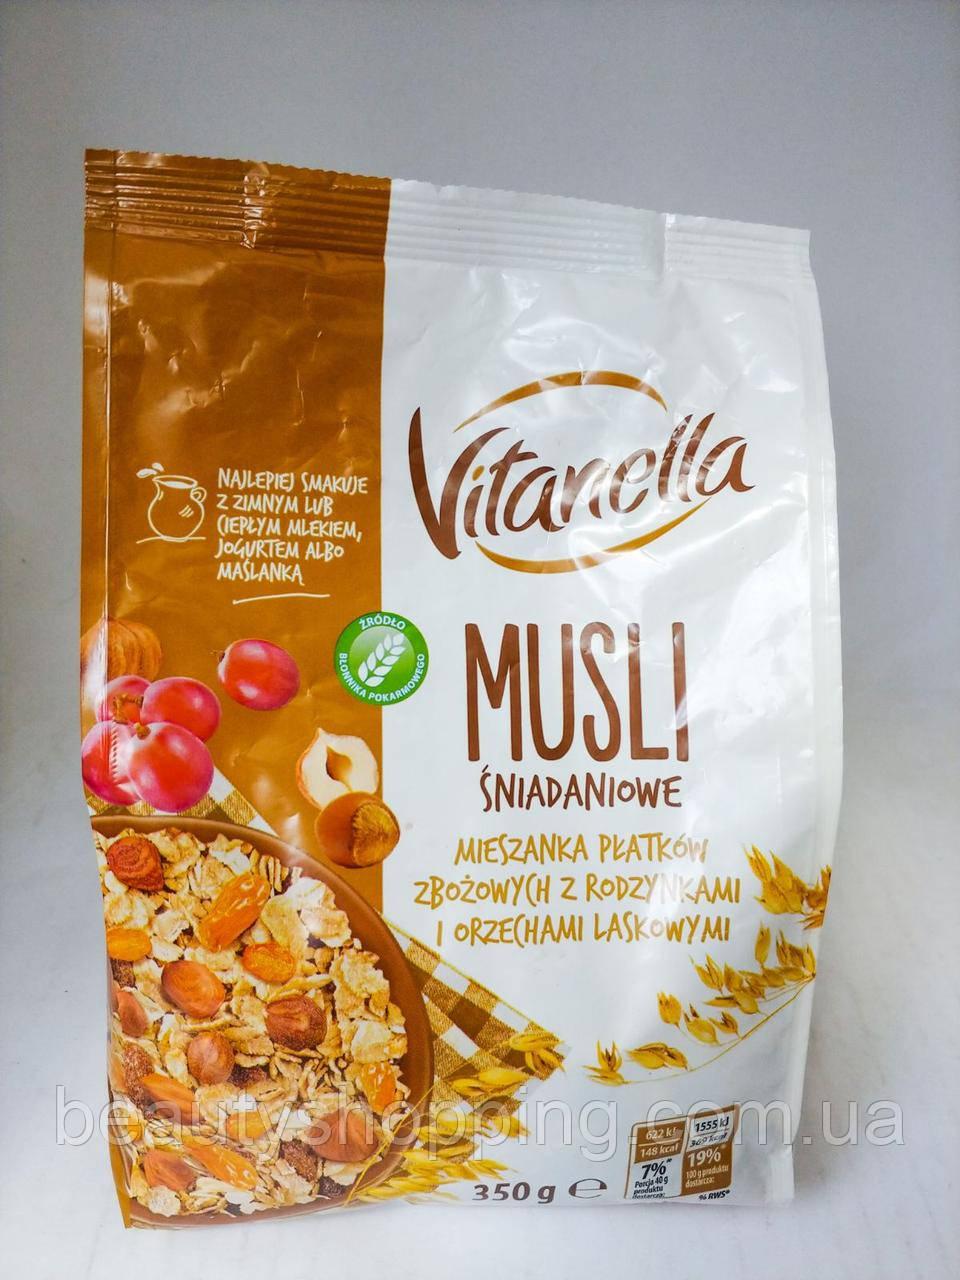 Мюсли микс изюма и орехов 350g Vitanella Польша